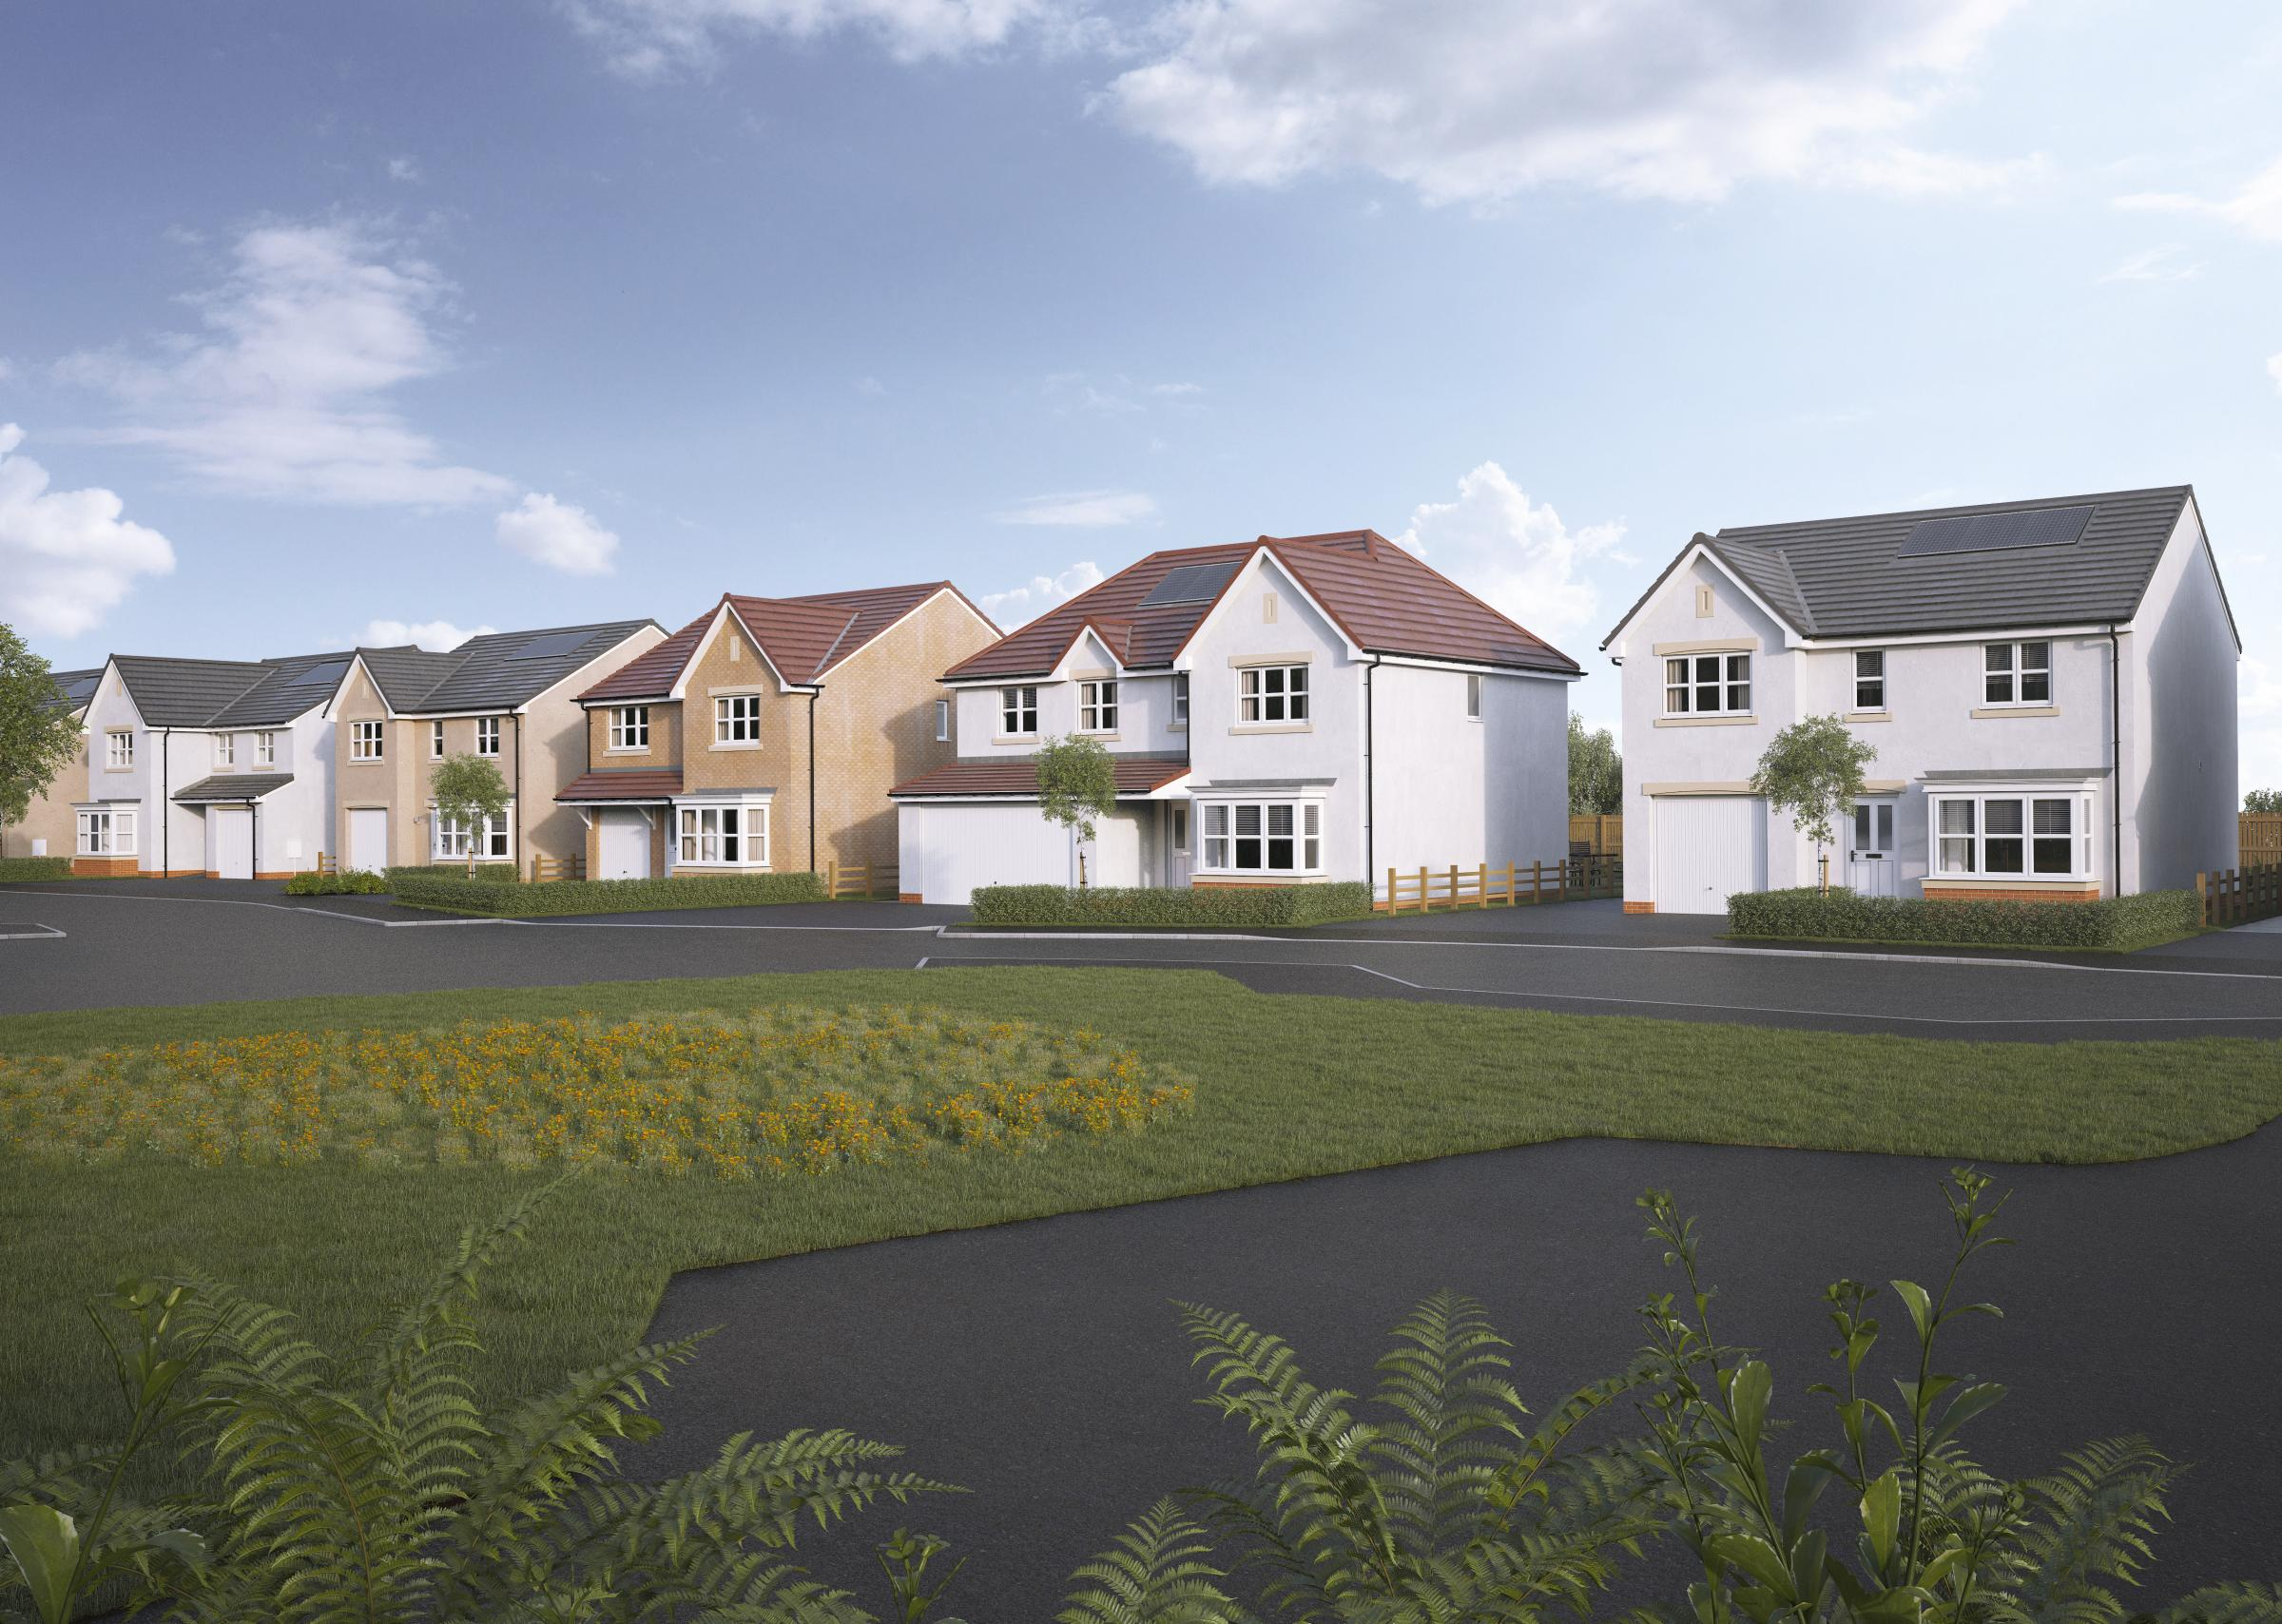 Miller Homes launch new housing deelopment Stoneyetts Village in Moodiesburn near Glasgow